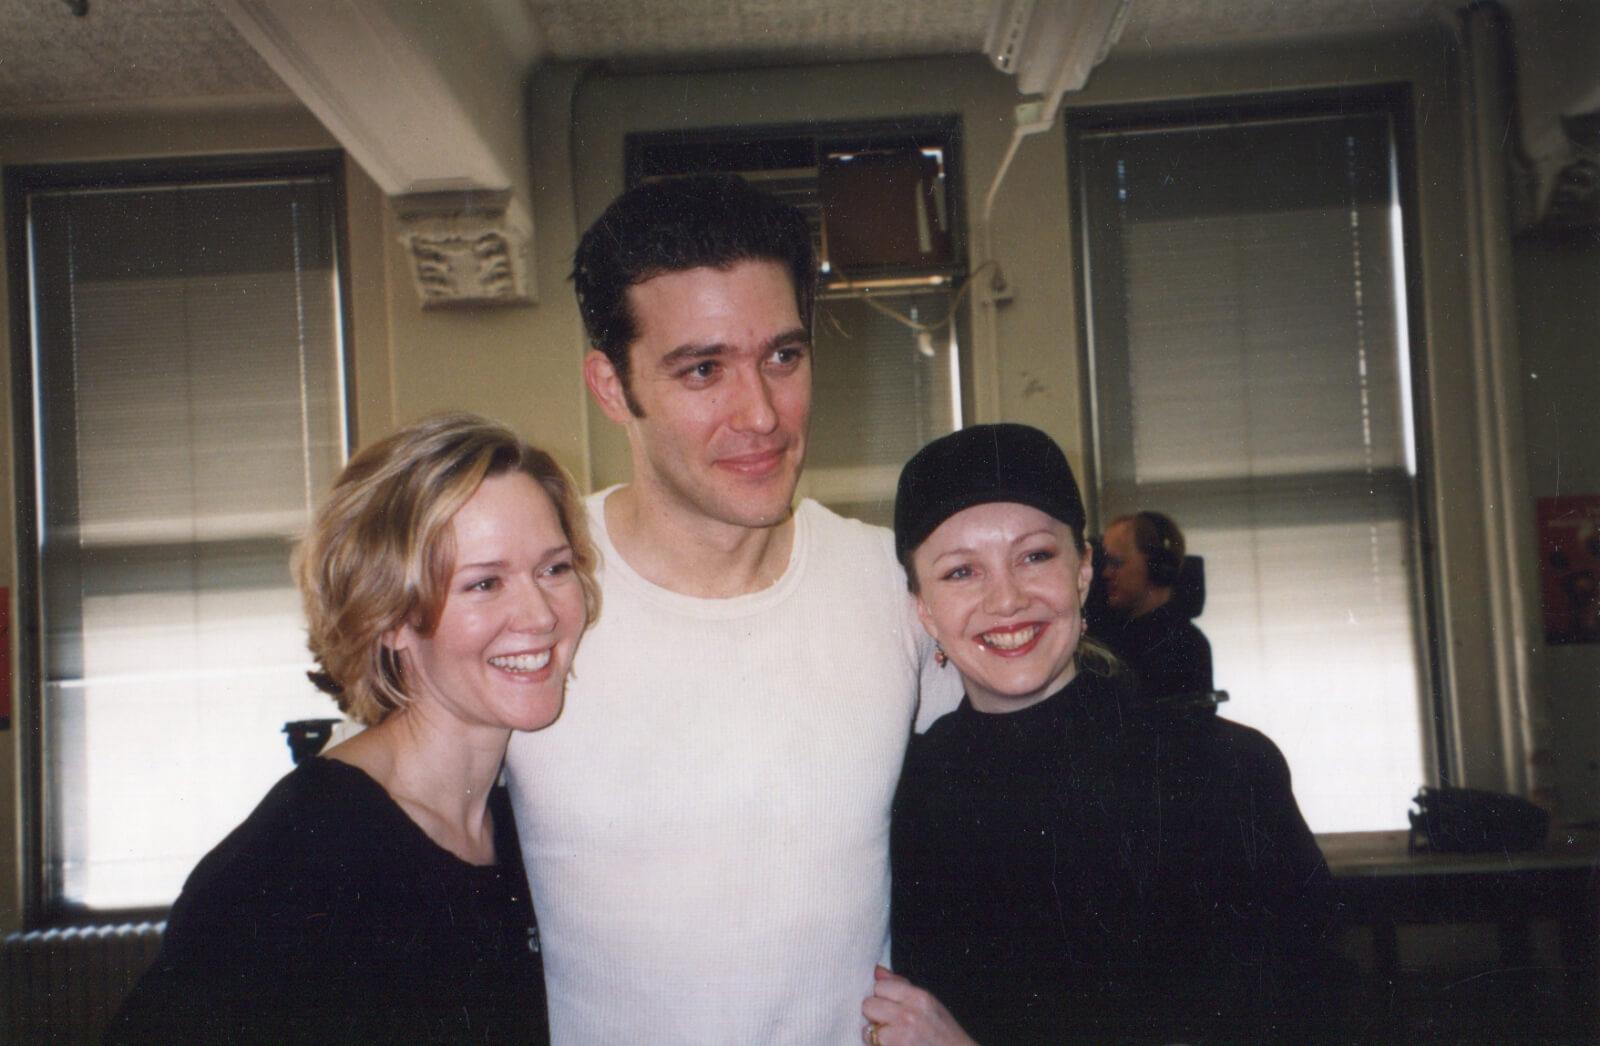 Rebecca Luker, Craig Bierko and Susan Stroman in rehearsal for The Music Man.